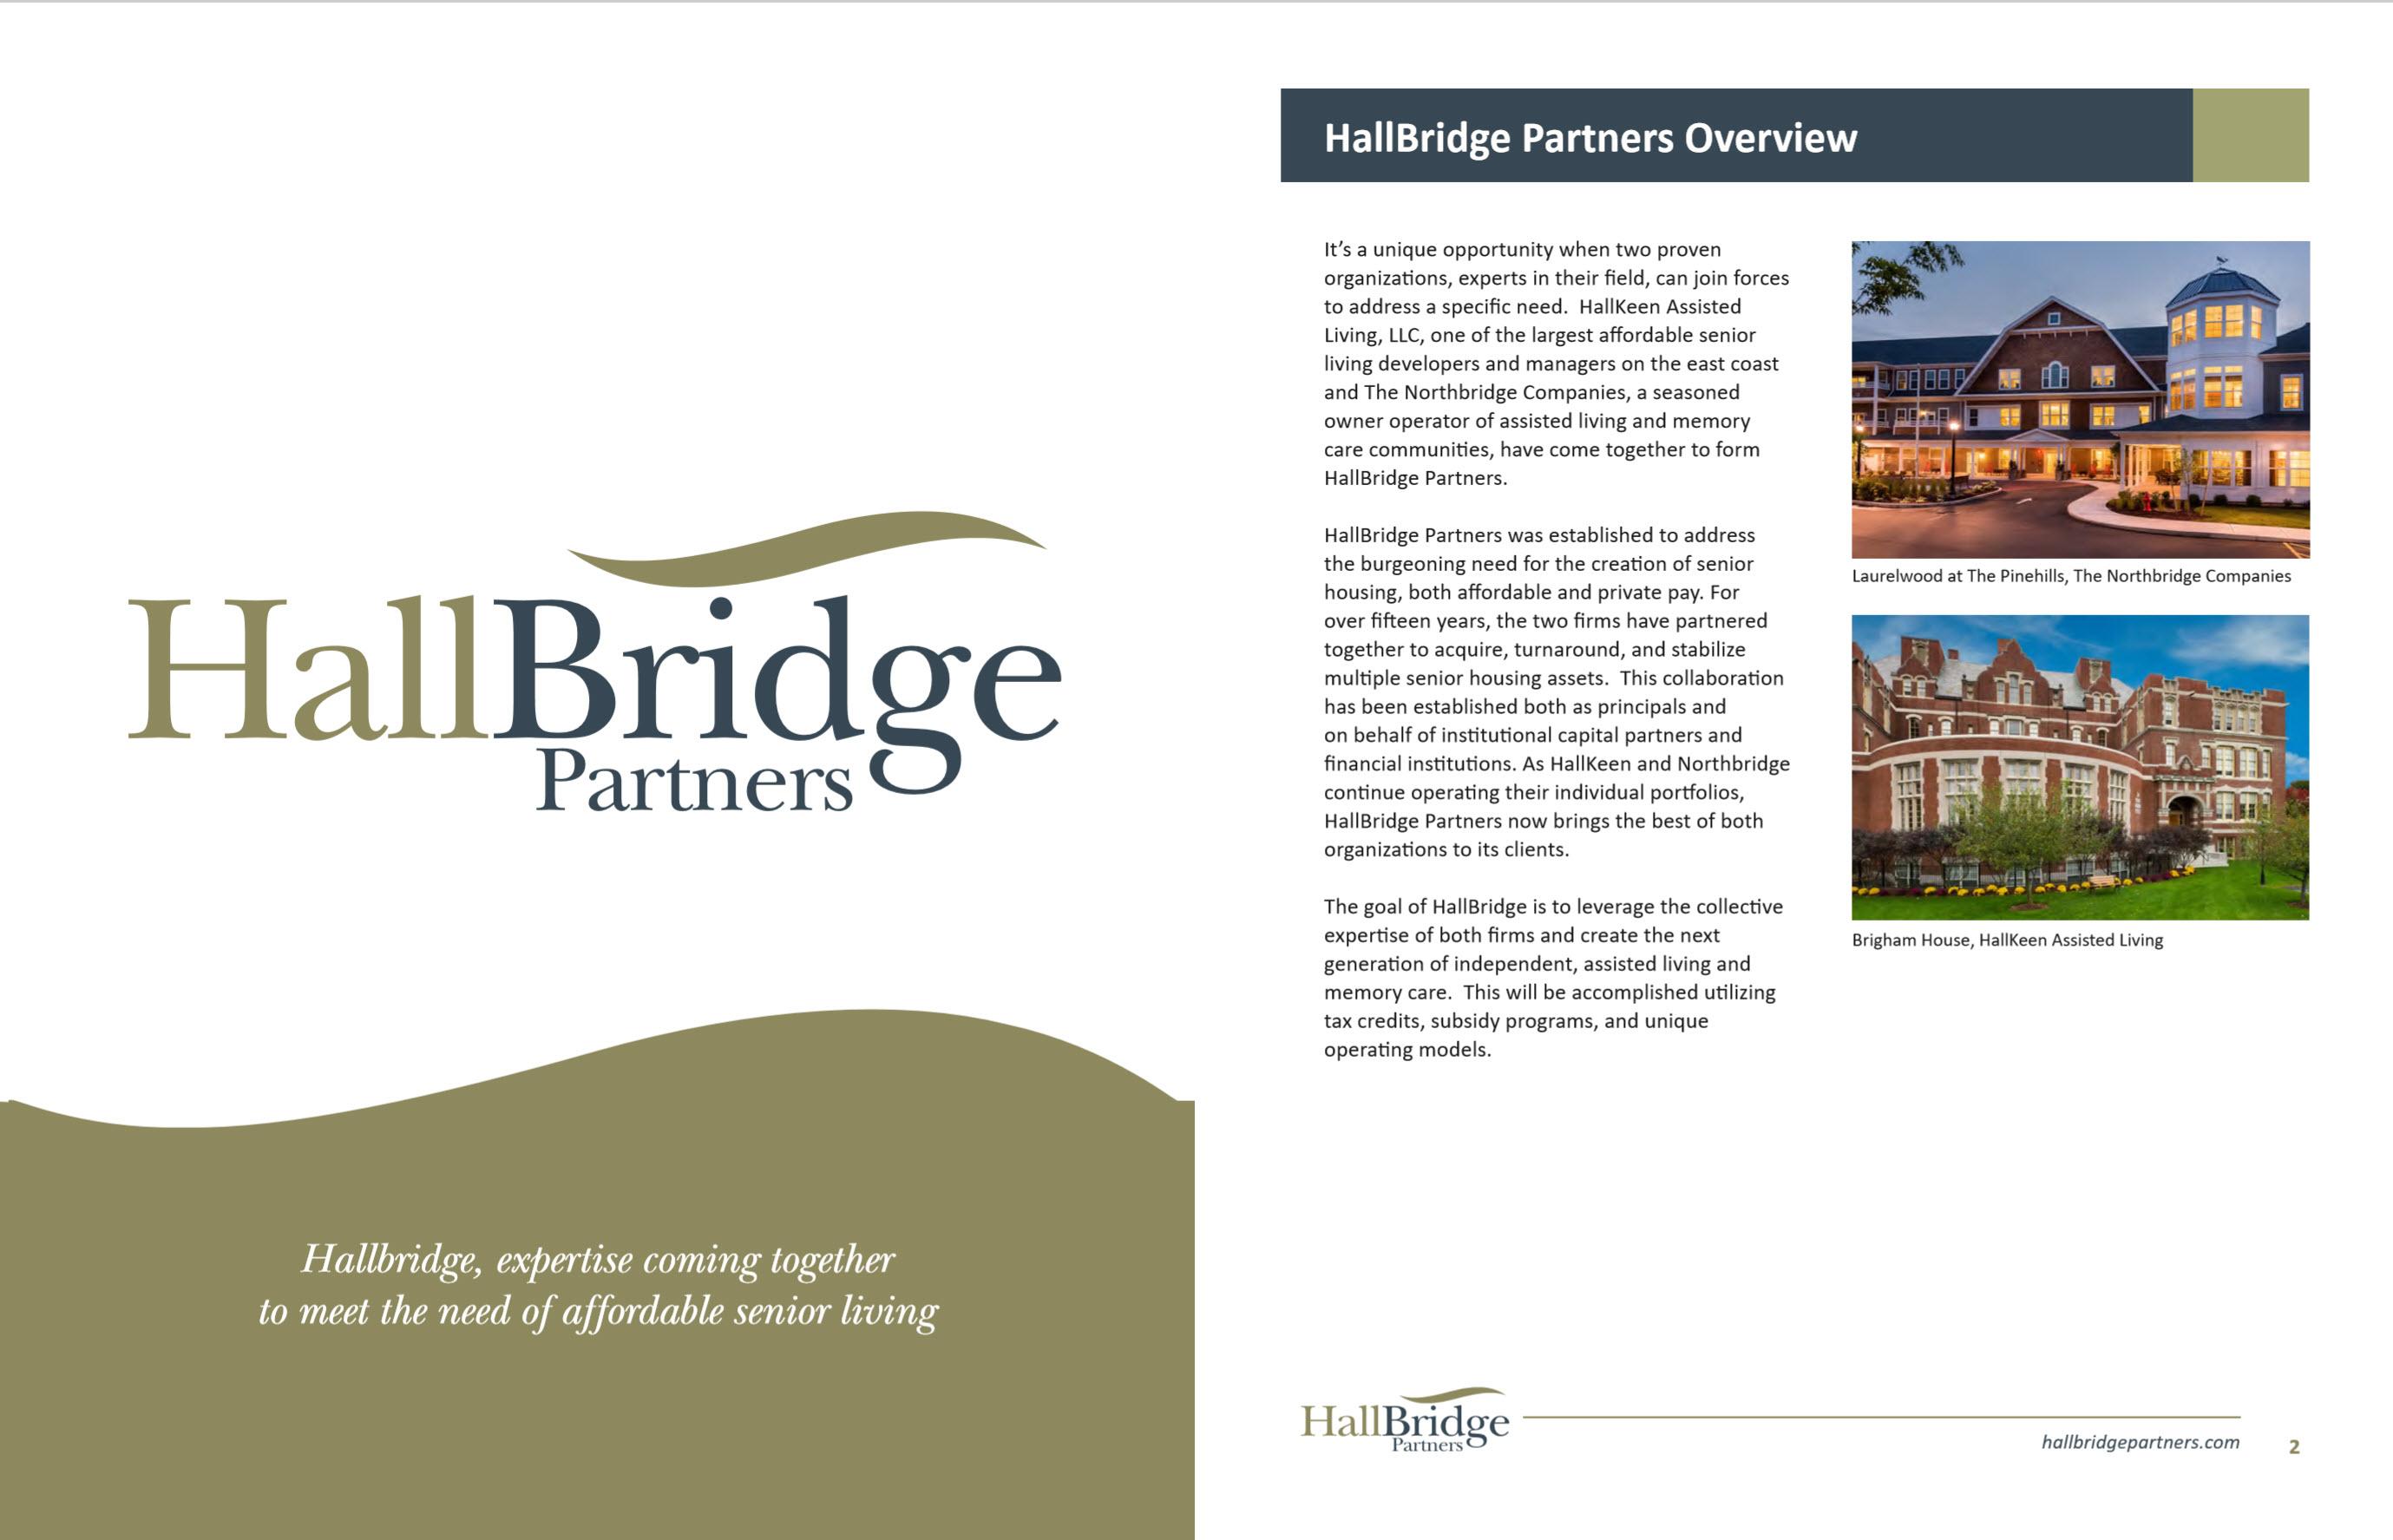 HallBridge Partners Overview